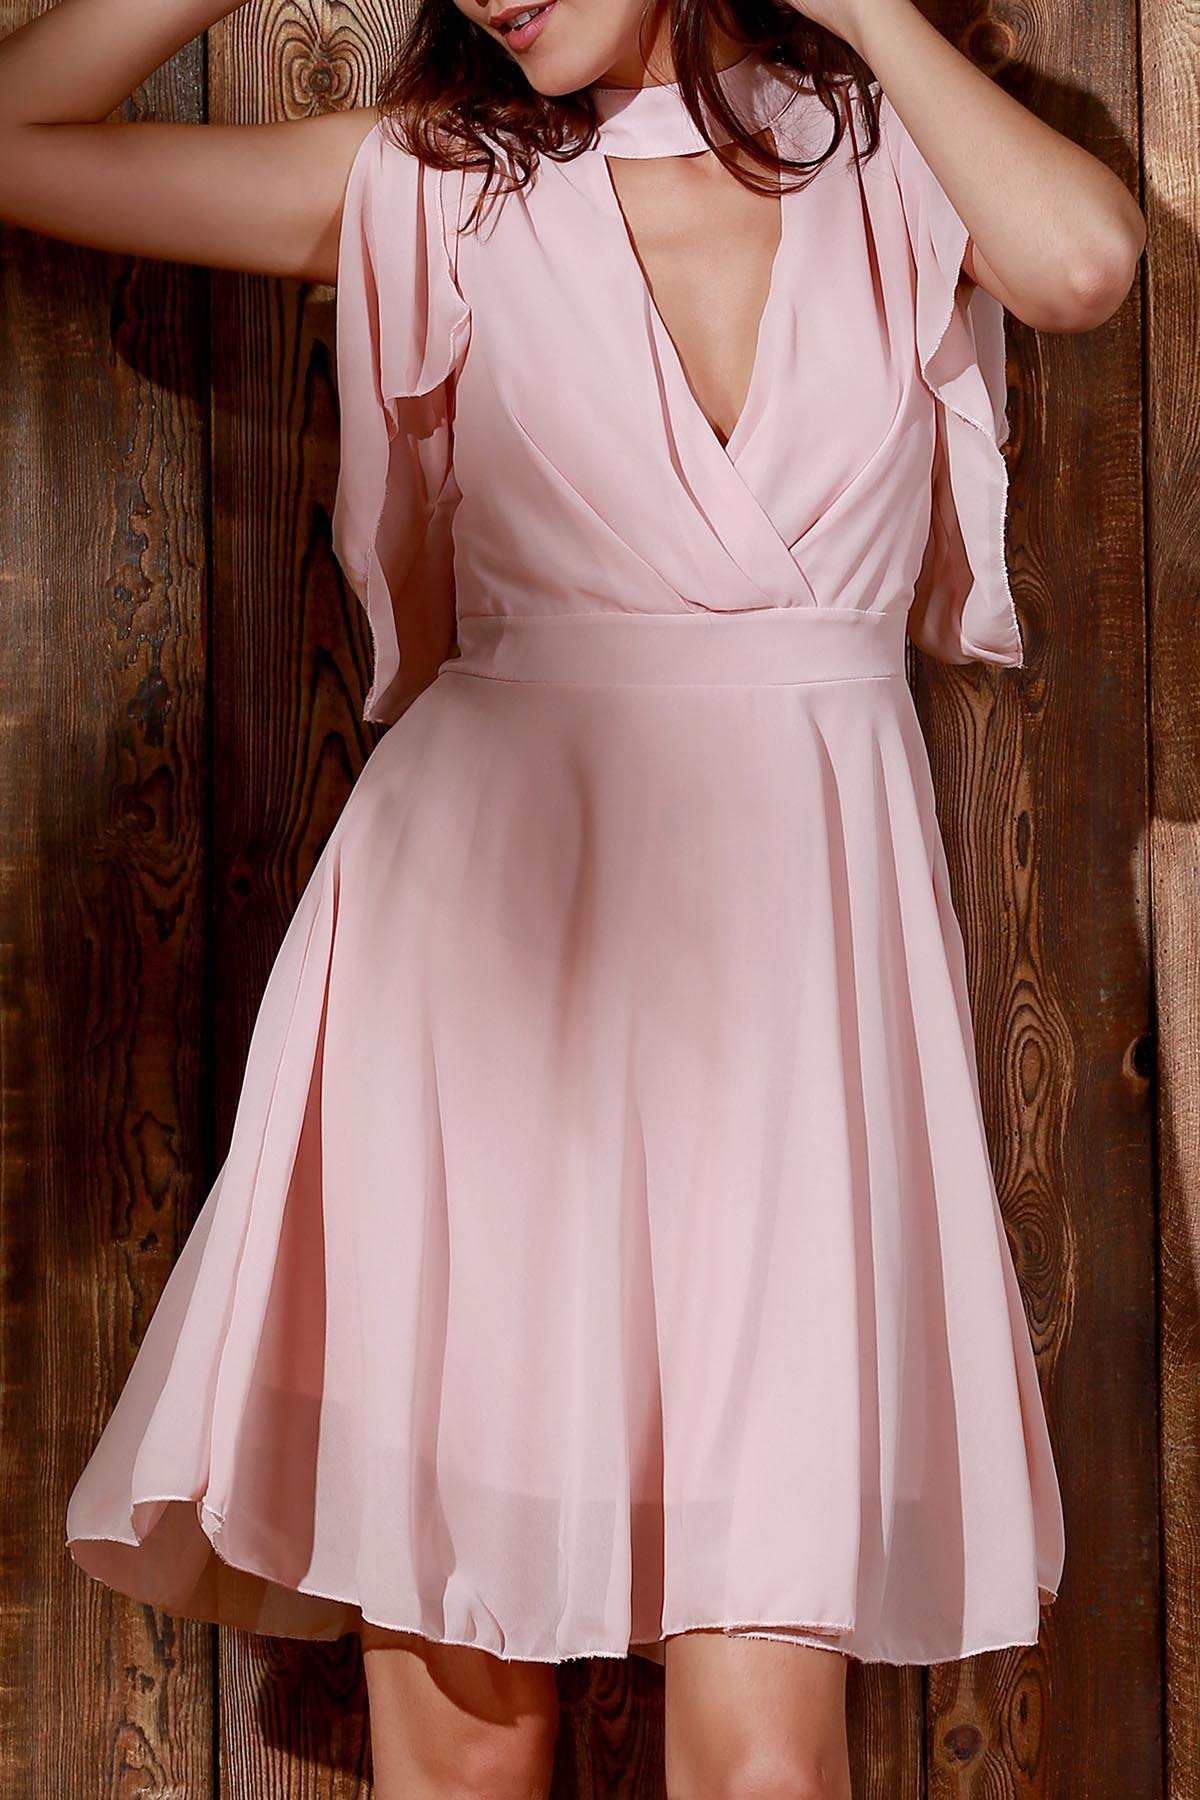 V-Neck Flouncing Sleeve Pink Chiffon Dress